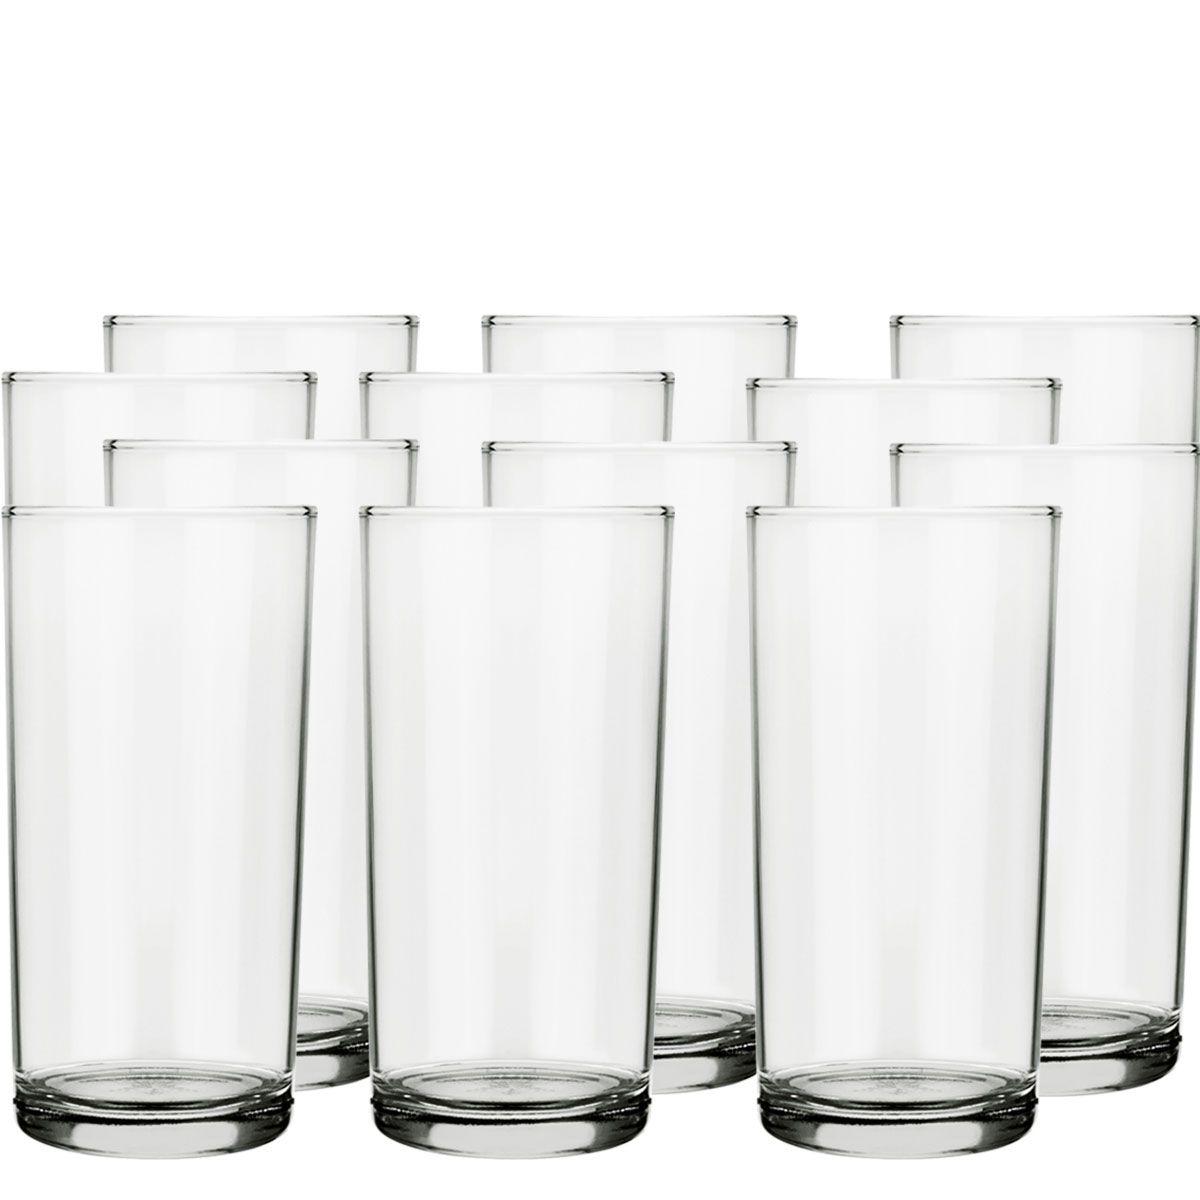 Copos De Suco Ou Água - Cilindro De 300ml C/ 12 Unid